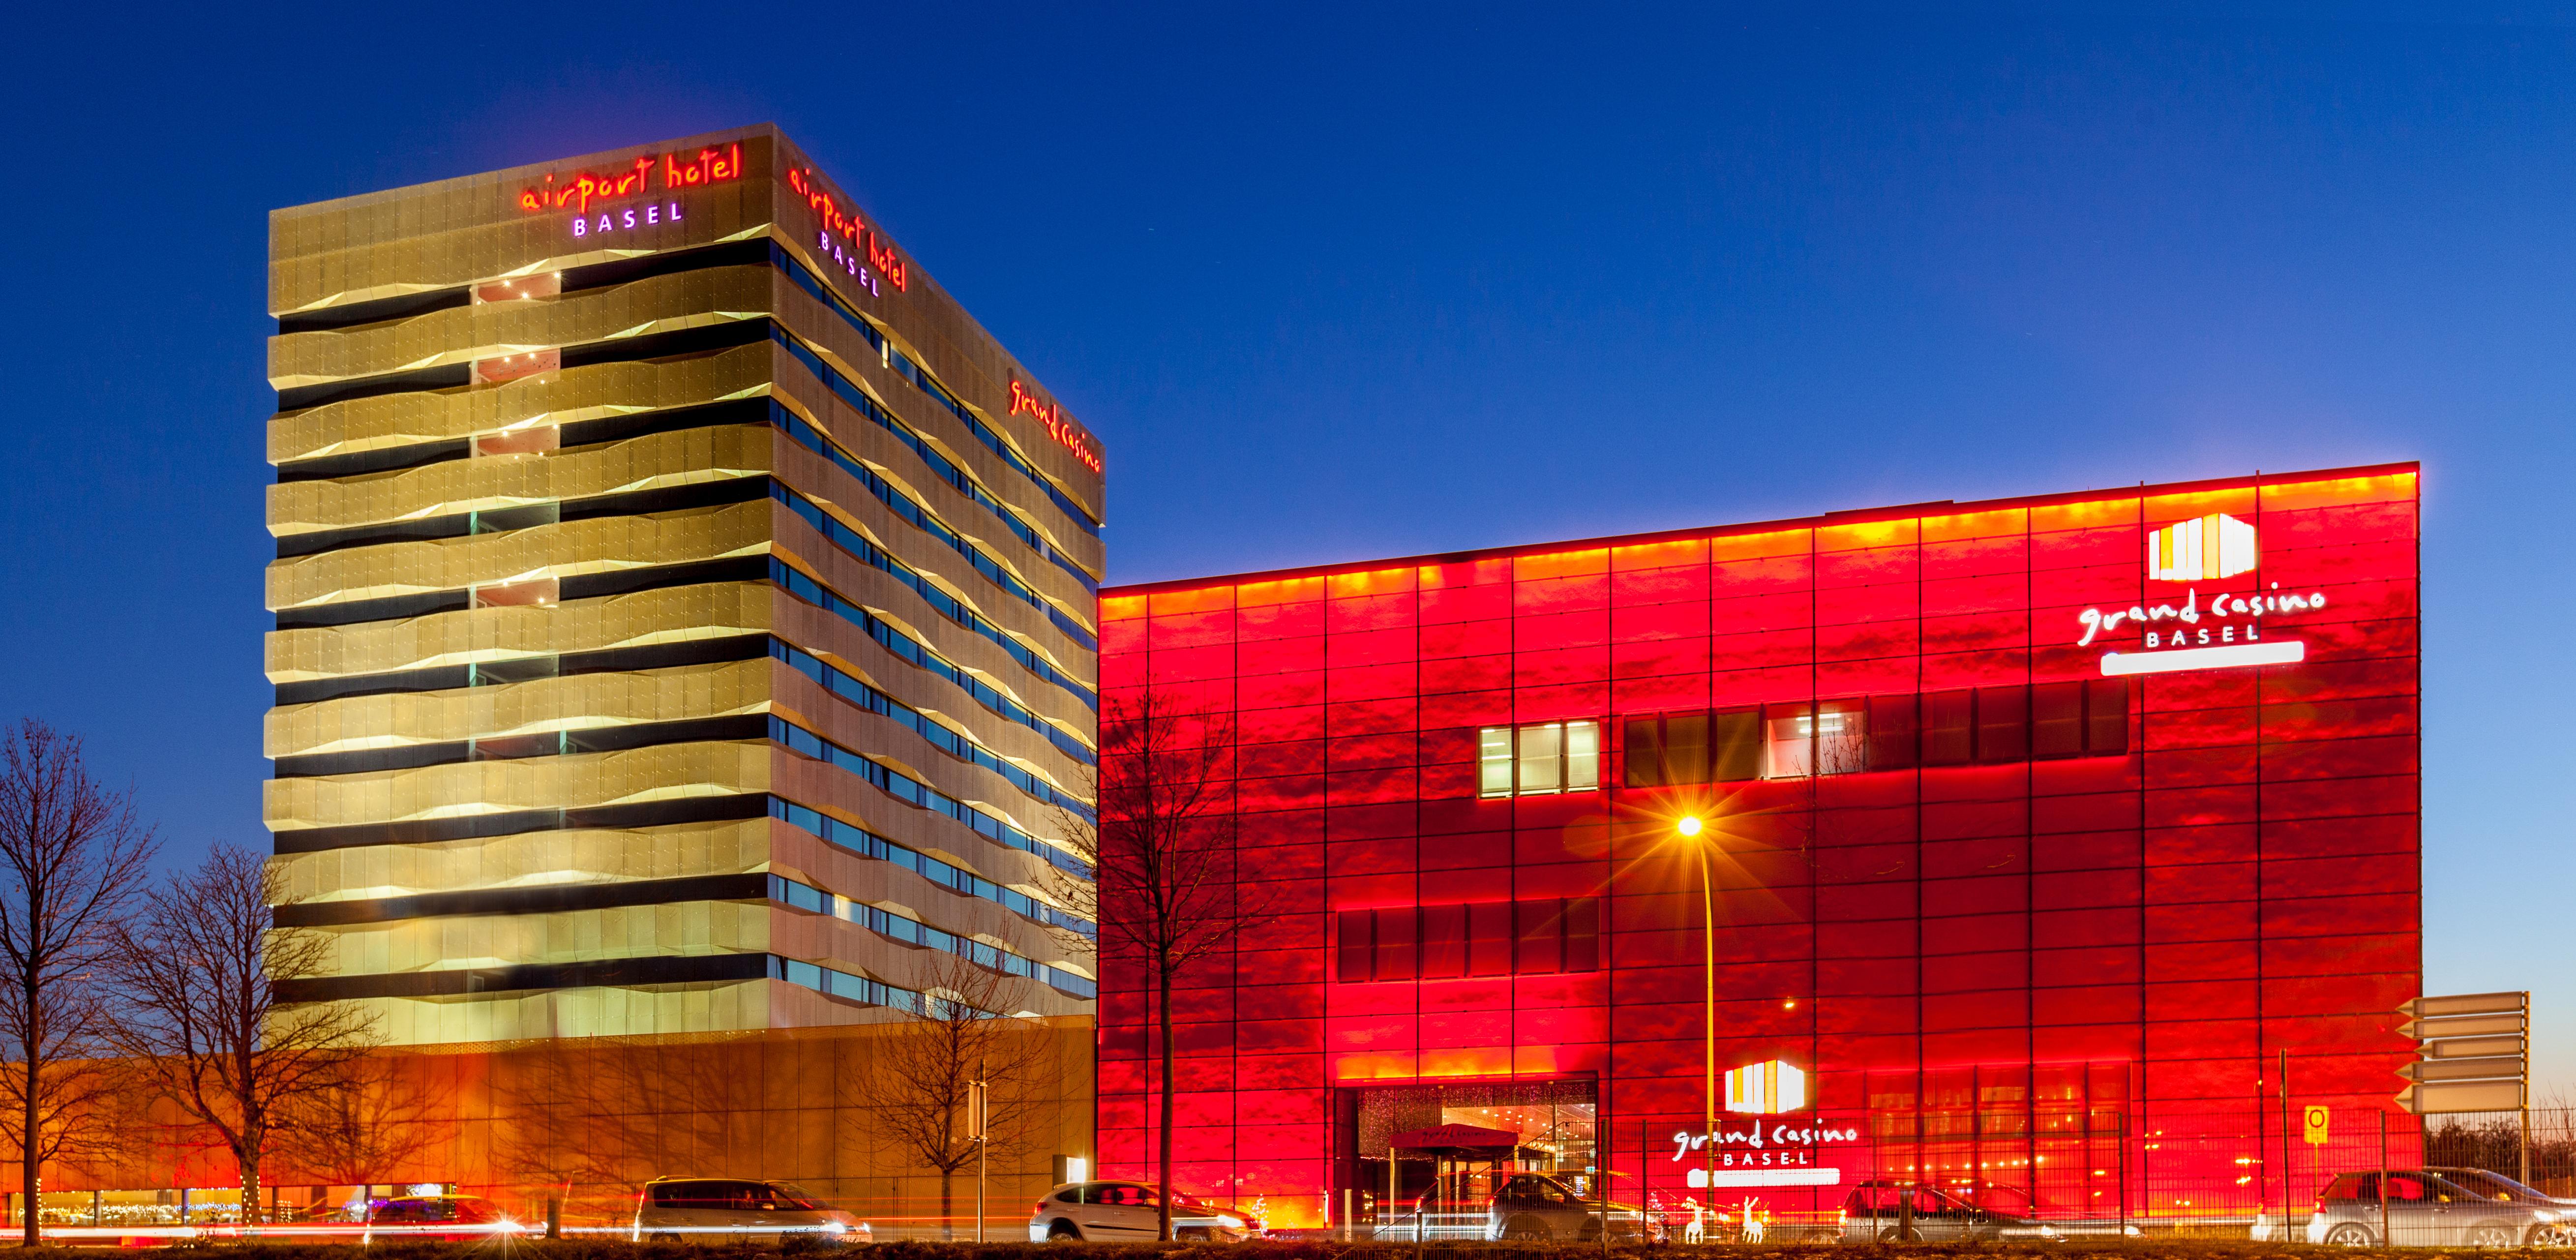 Airport Hotel Basel, Basel